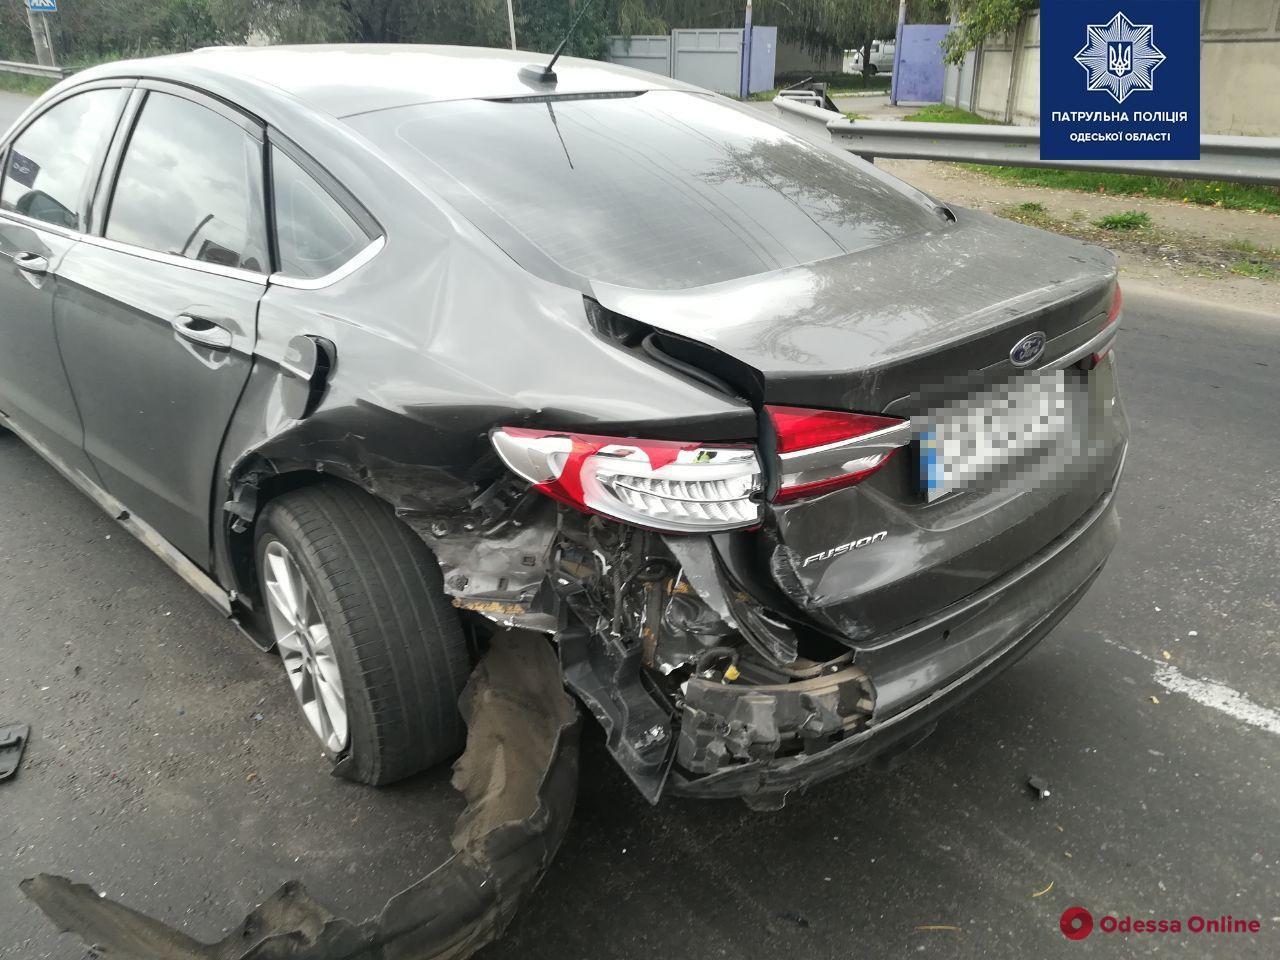 На Объездной дороге столкнулись Daewoo и Ford